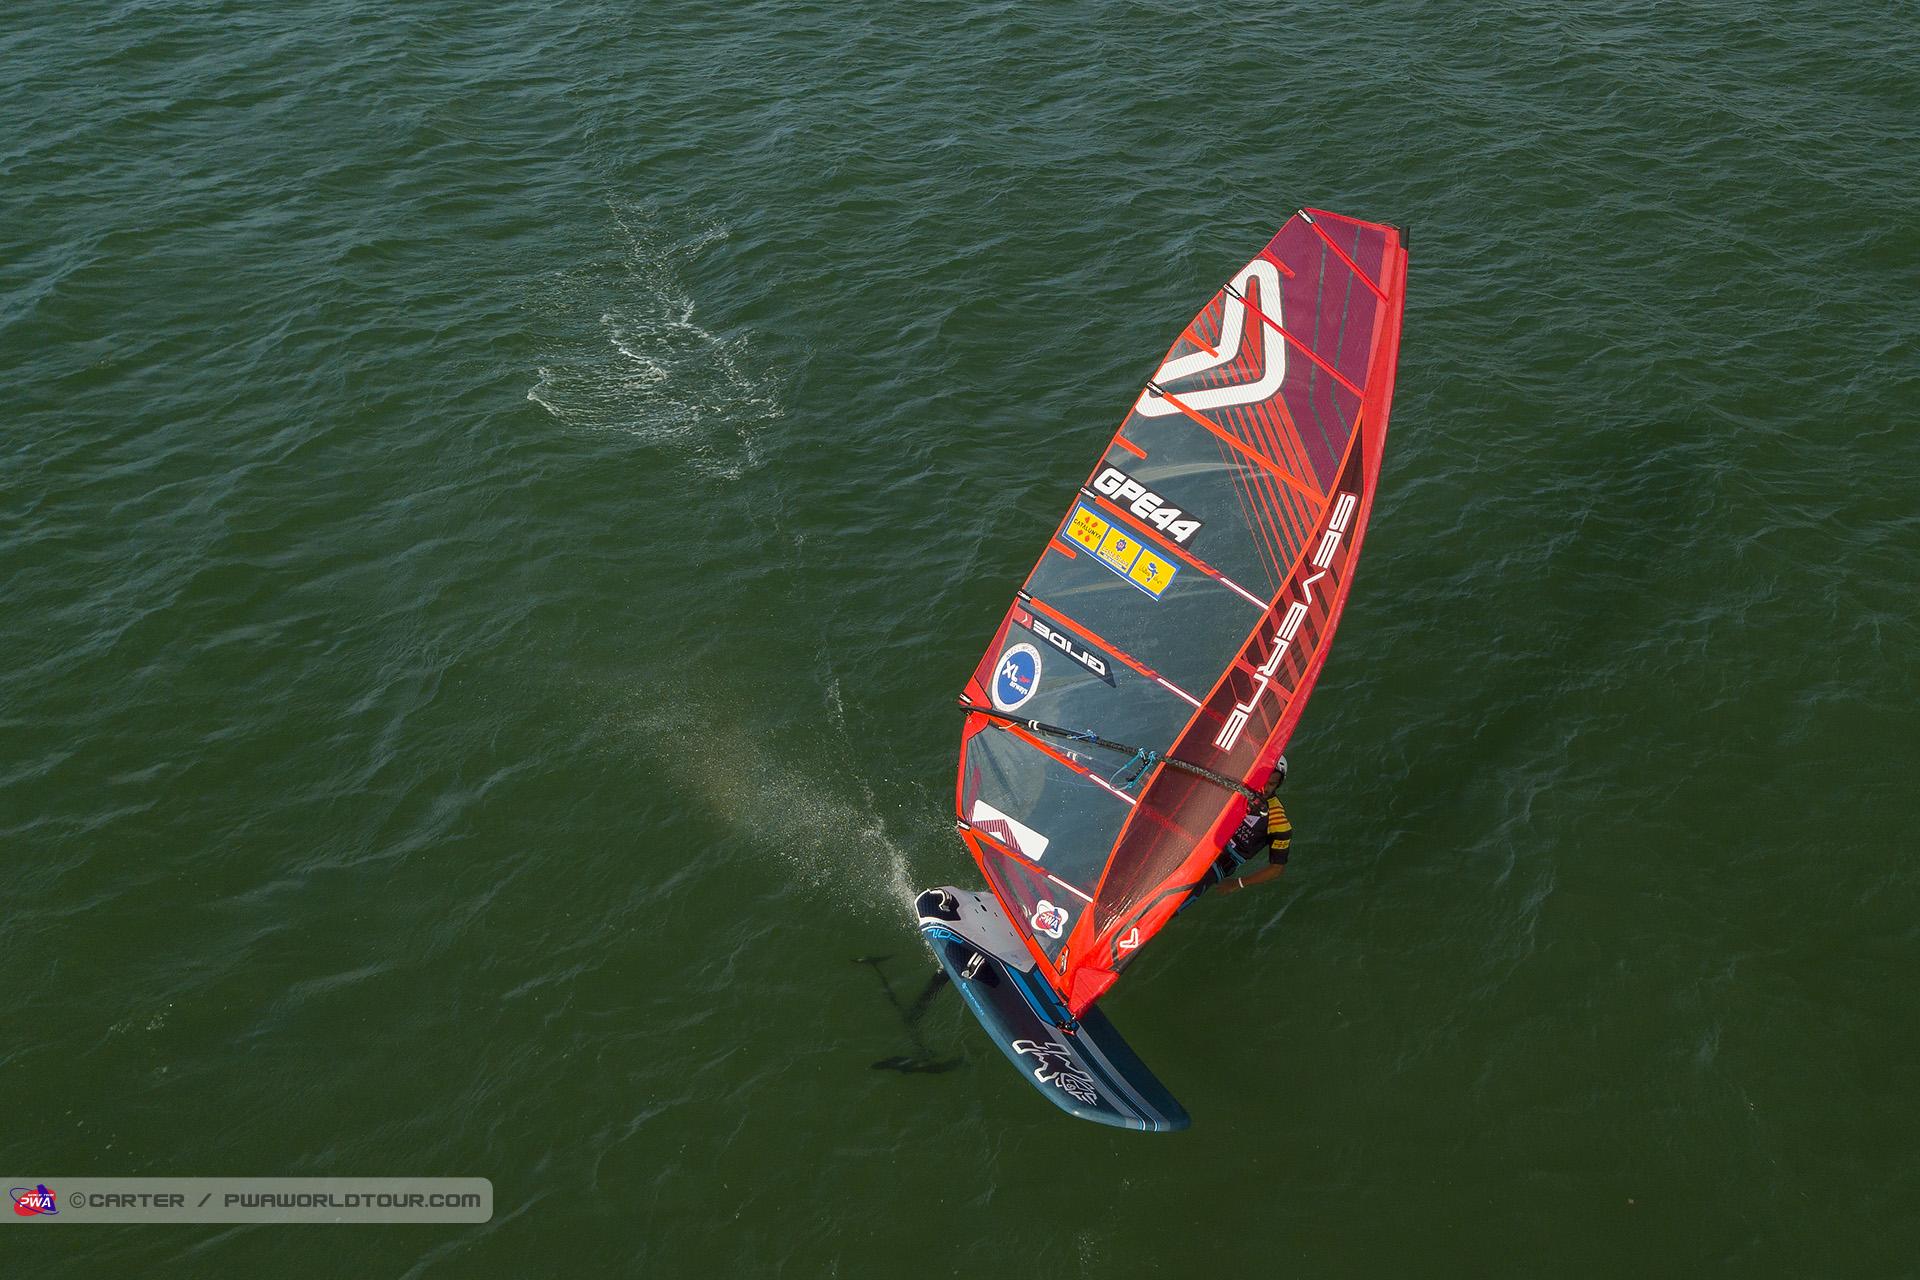 CB18_fl_Tristan_Algret_Aeroworx_drone_photo.jpg